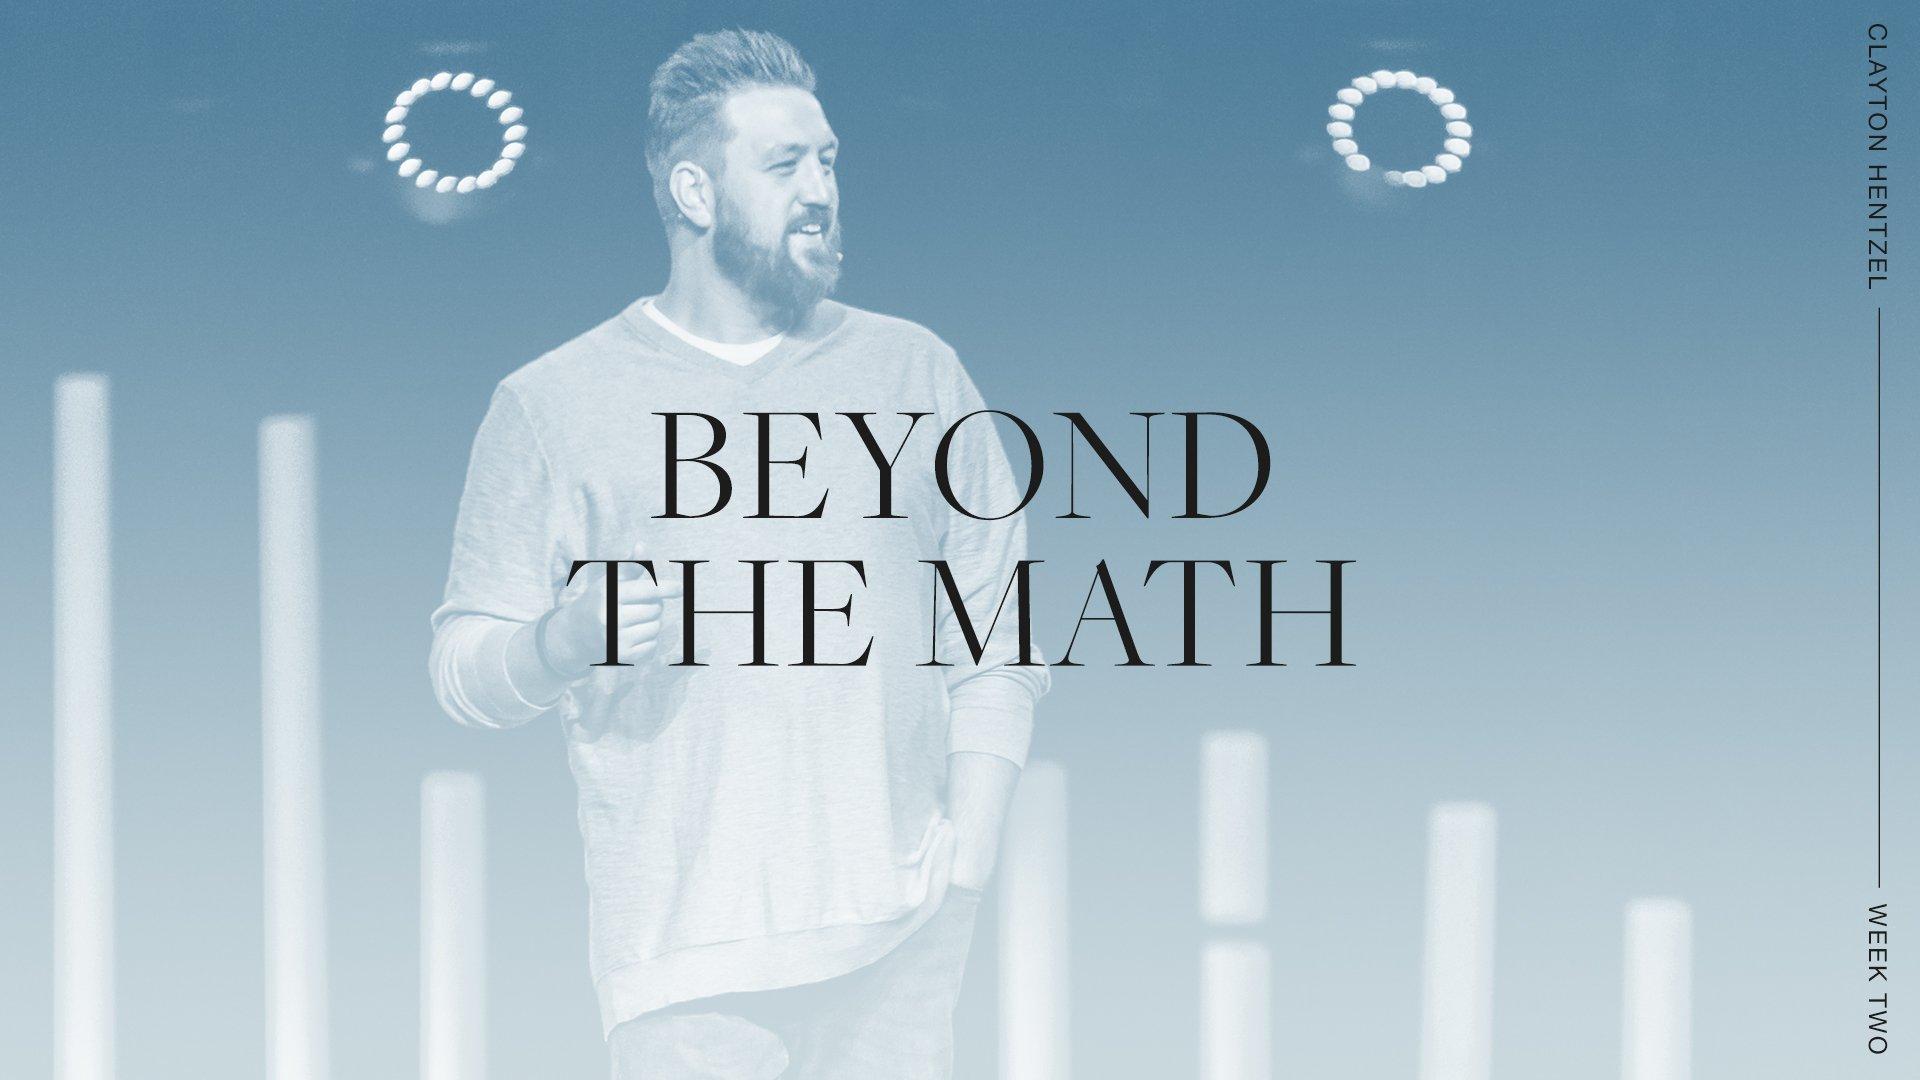 Beyond The Math